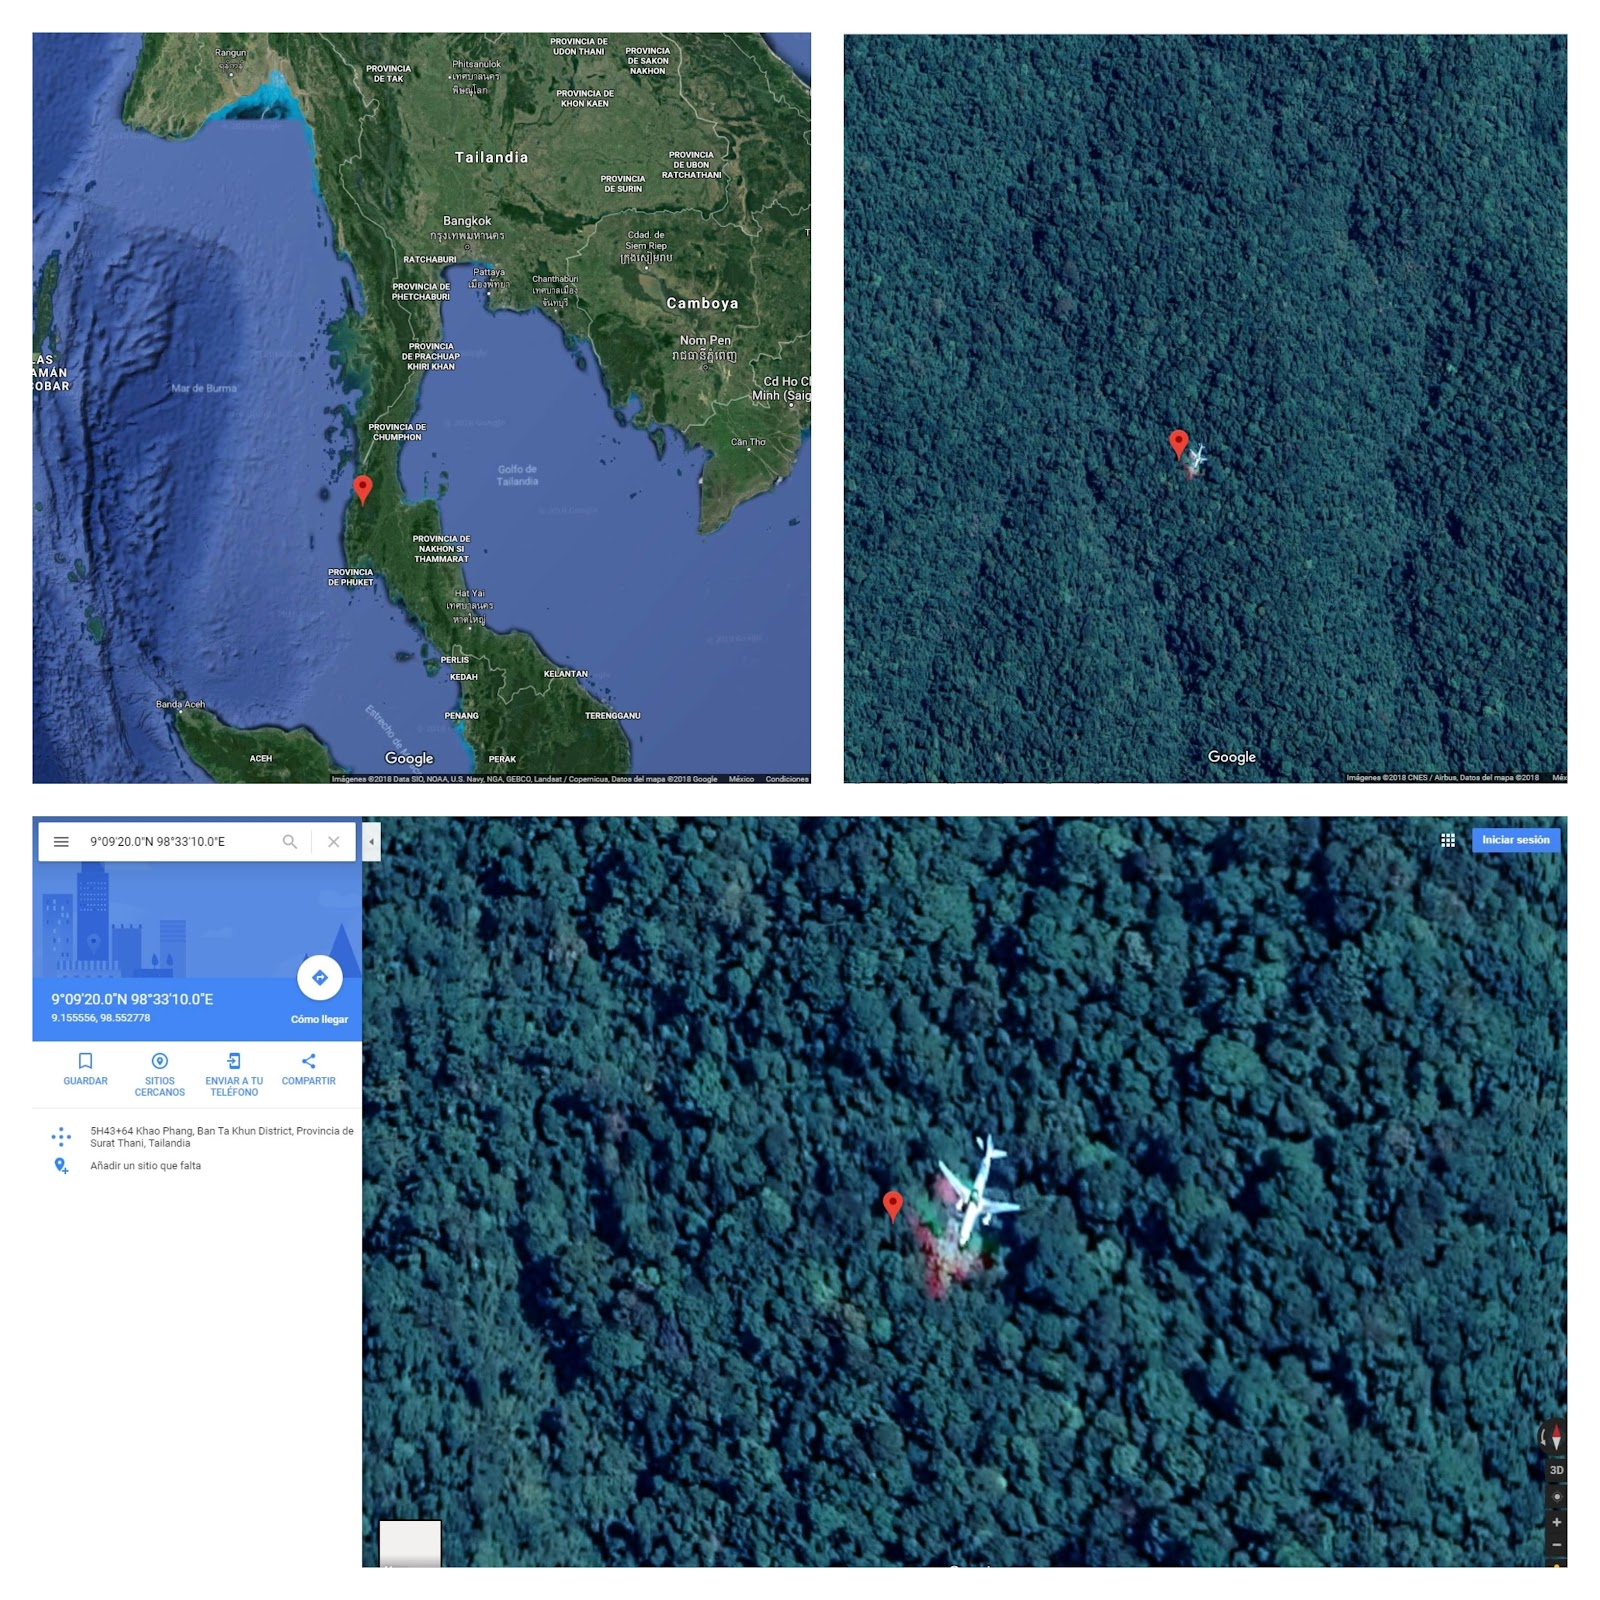 Aseguran haber encontrado al MH370 gracias a Google Maps